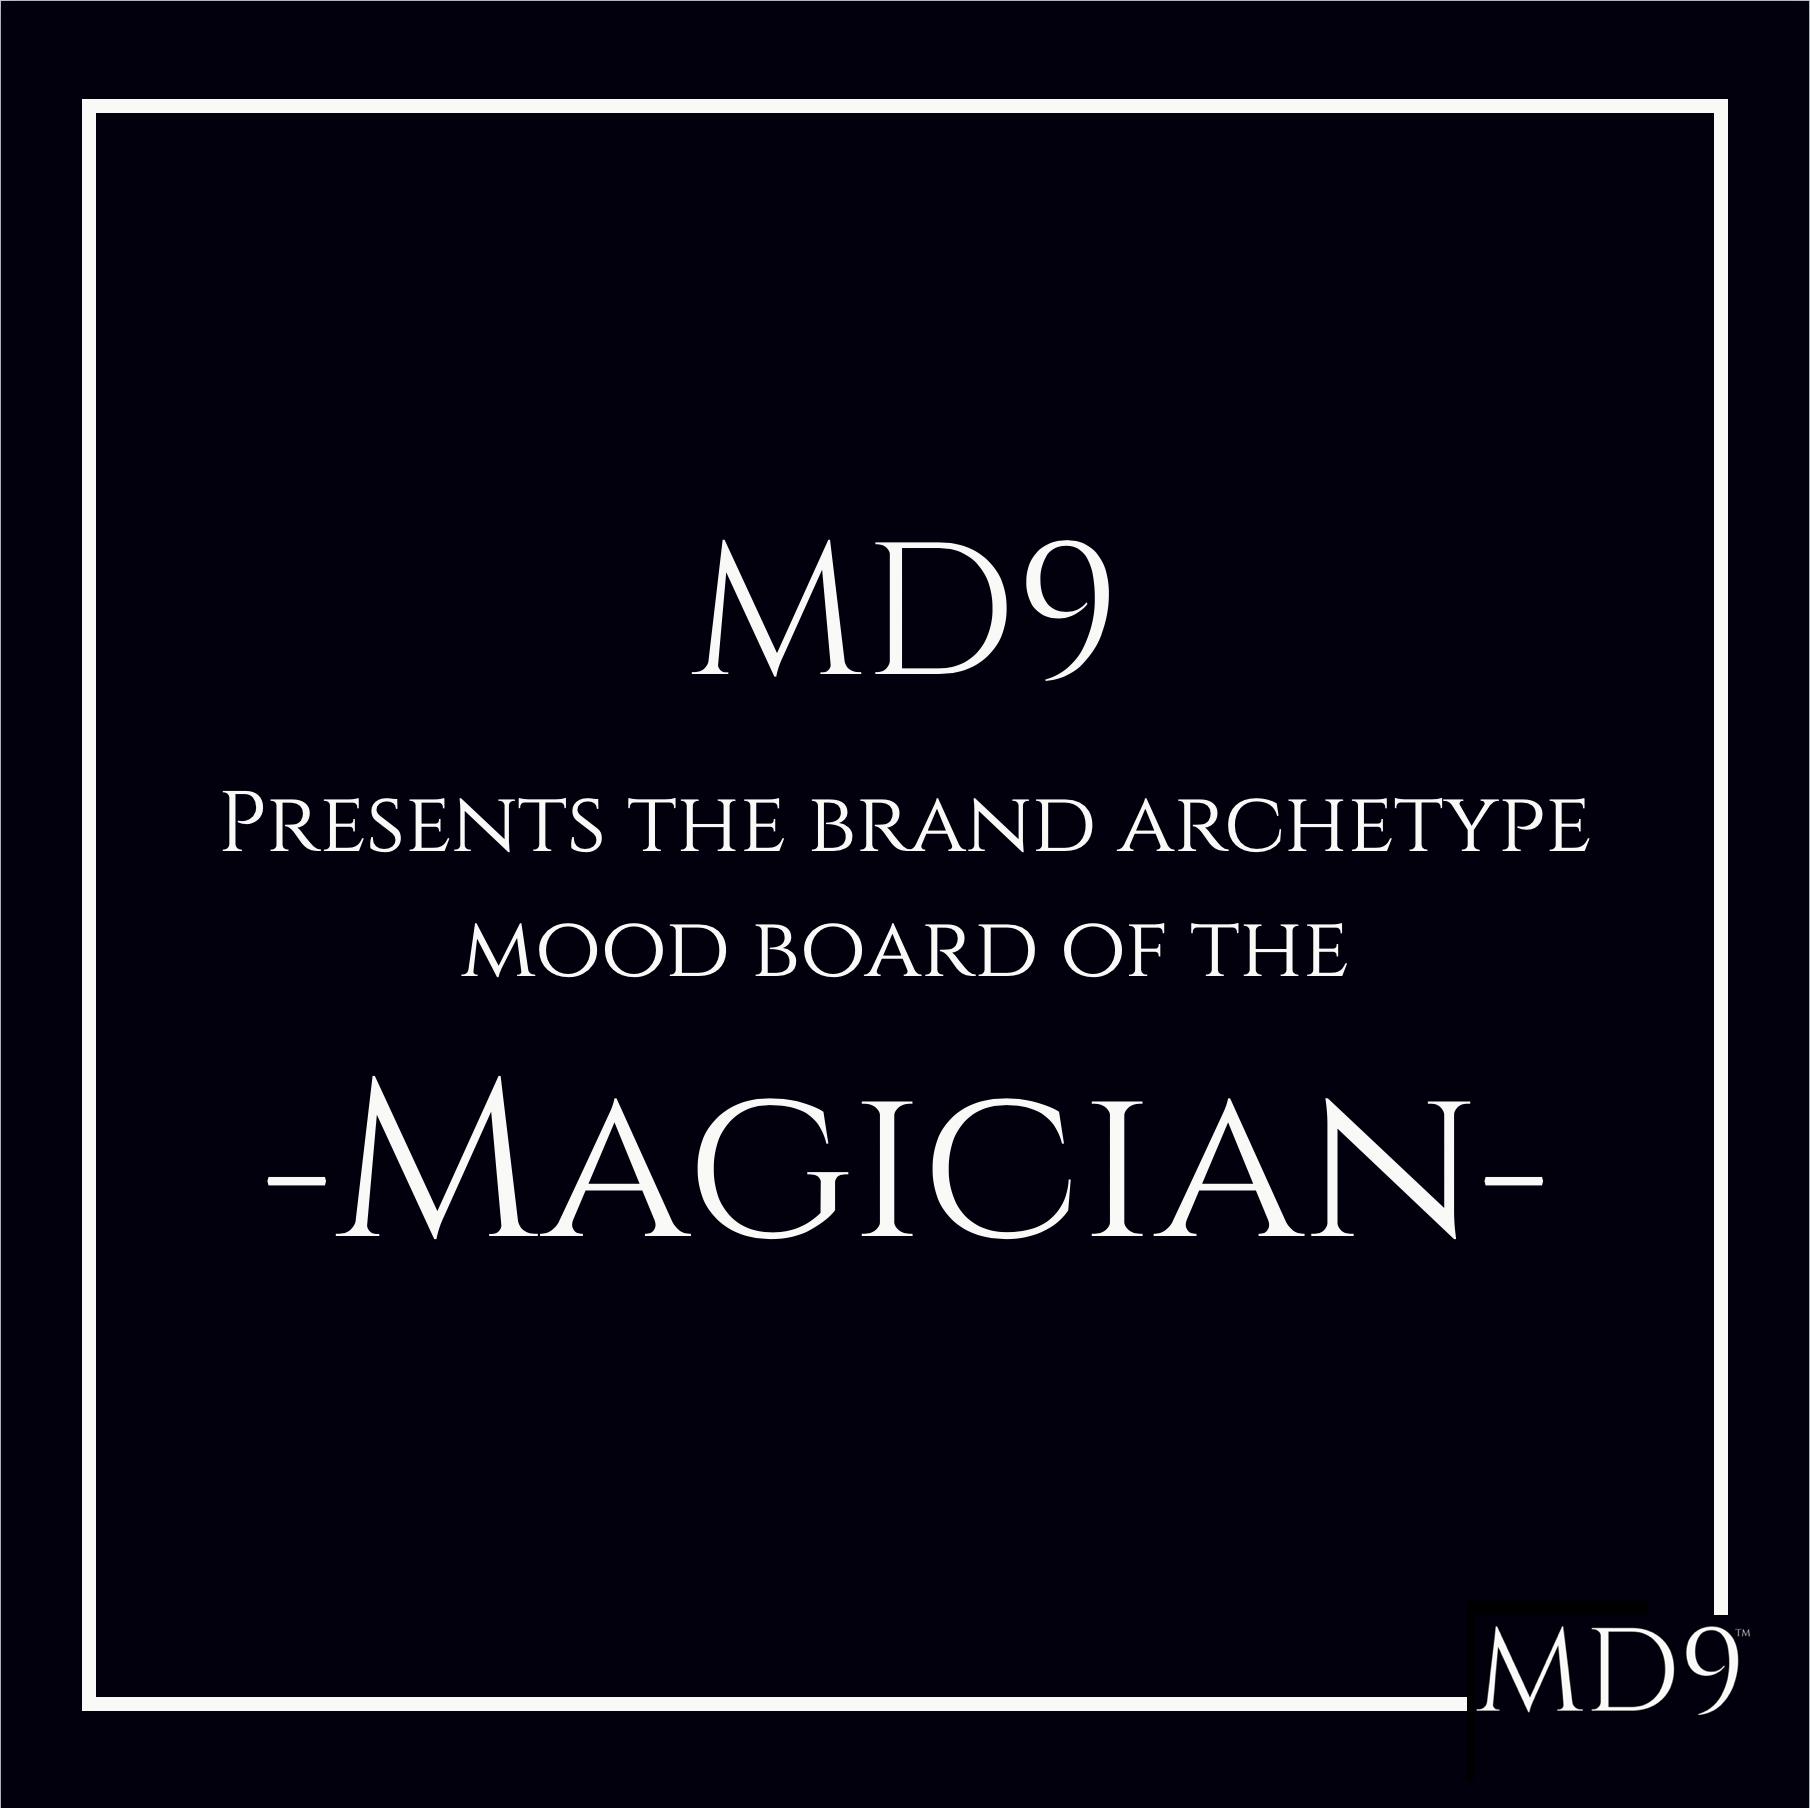 MD9's Brand Archetype Mood Board – Magician